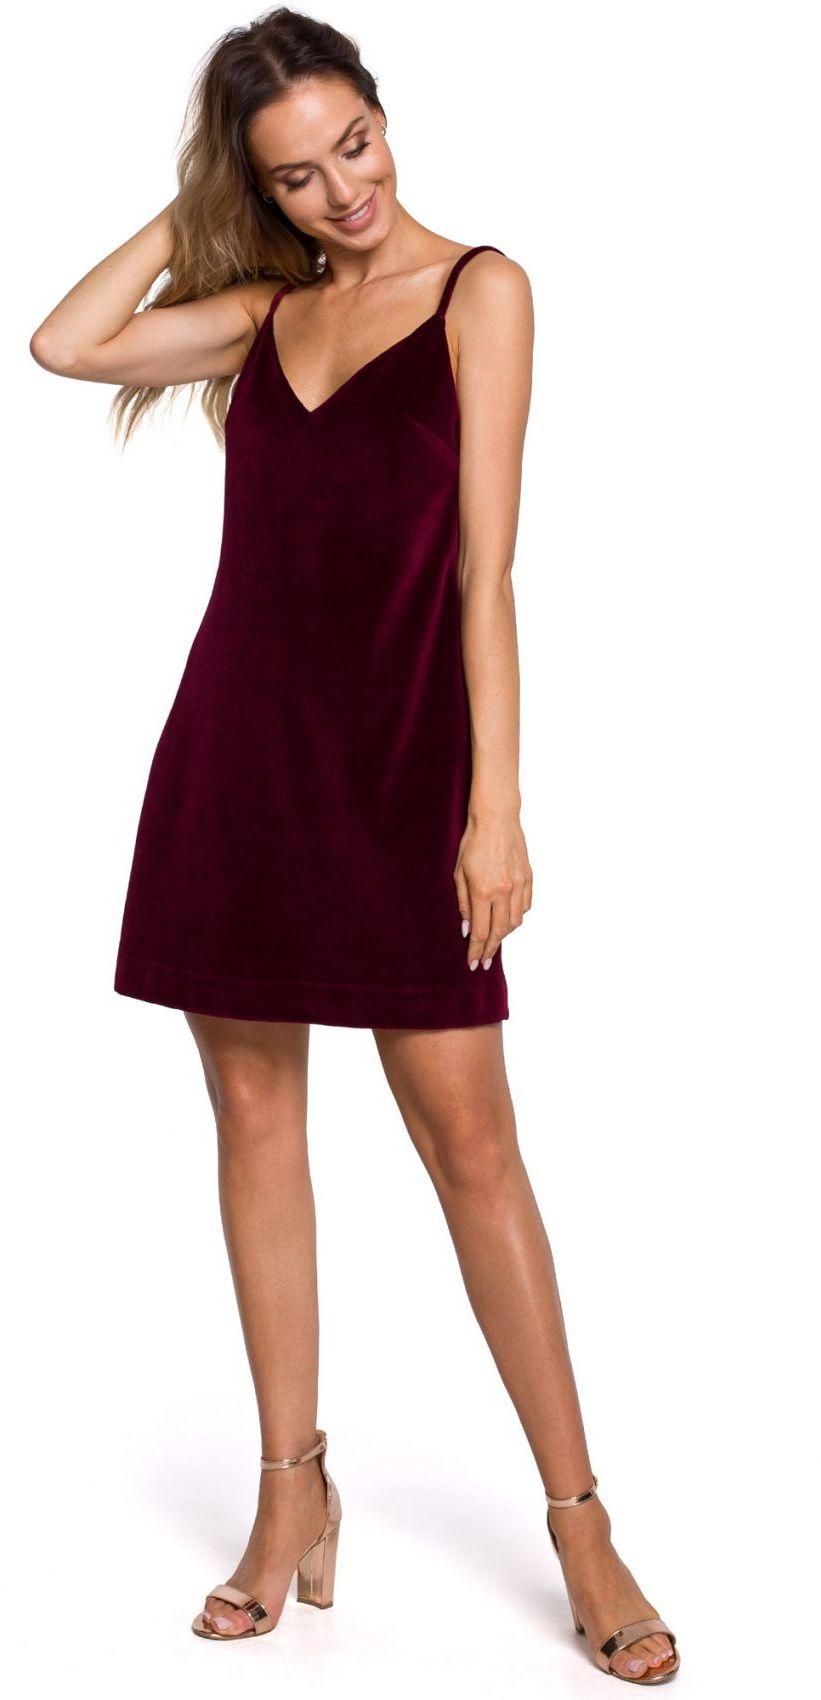 M560 Welurowa Sukienka Mini Na Ramiączkach - bordowa